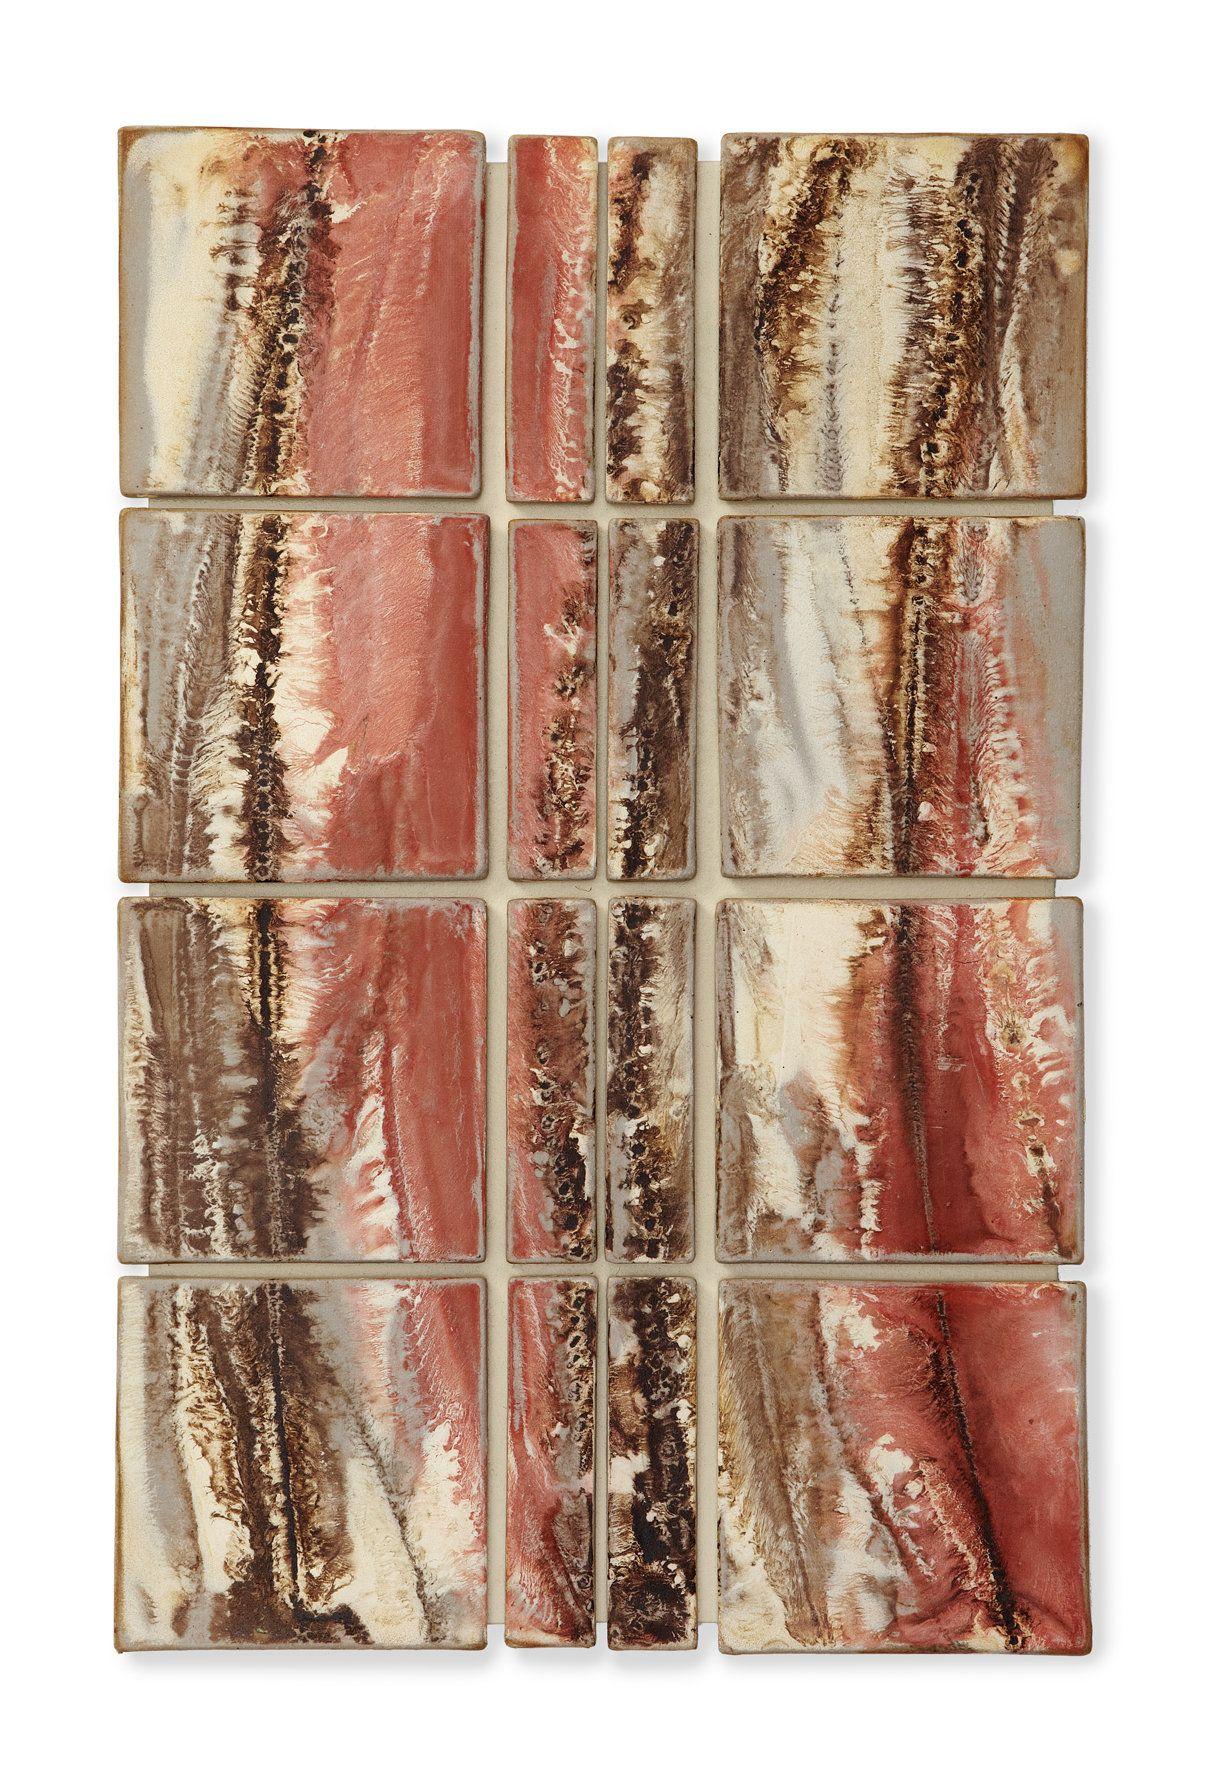 Desert Sands Kristi Sloniger Ceramic Wall Art Artful Home Ceramic Wall Art Ceramic Tile Art Ceramics